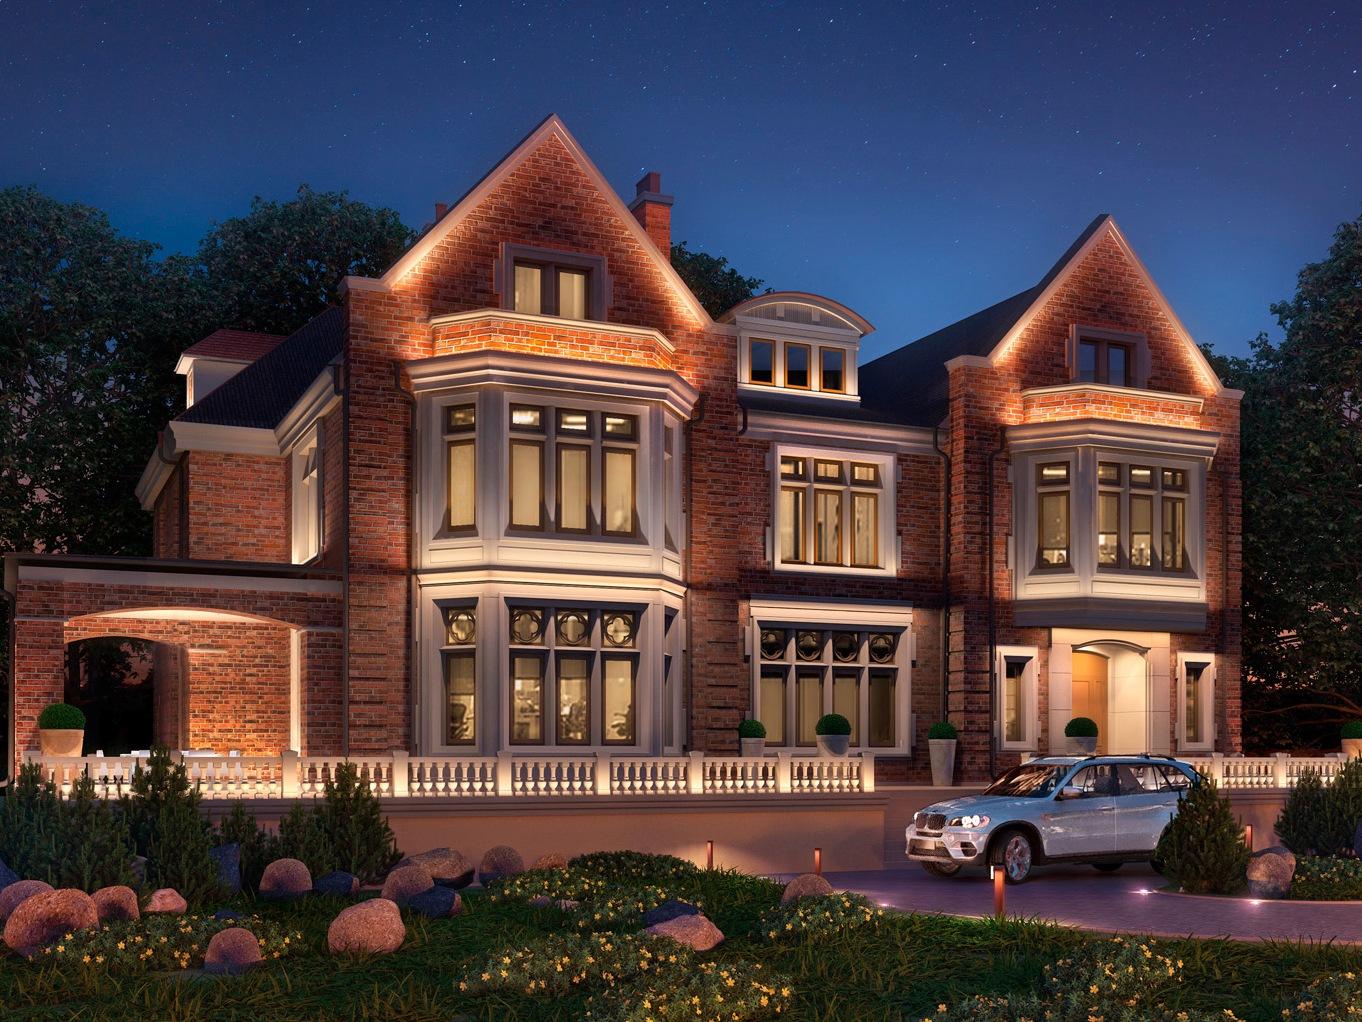 декоративная подсветка дома фасада